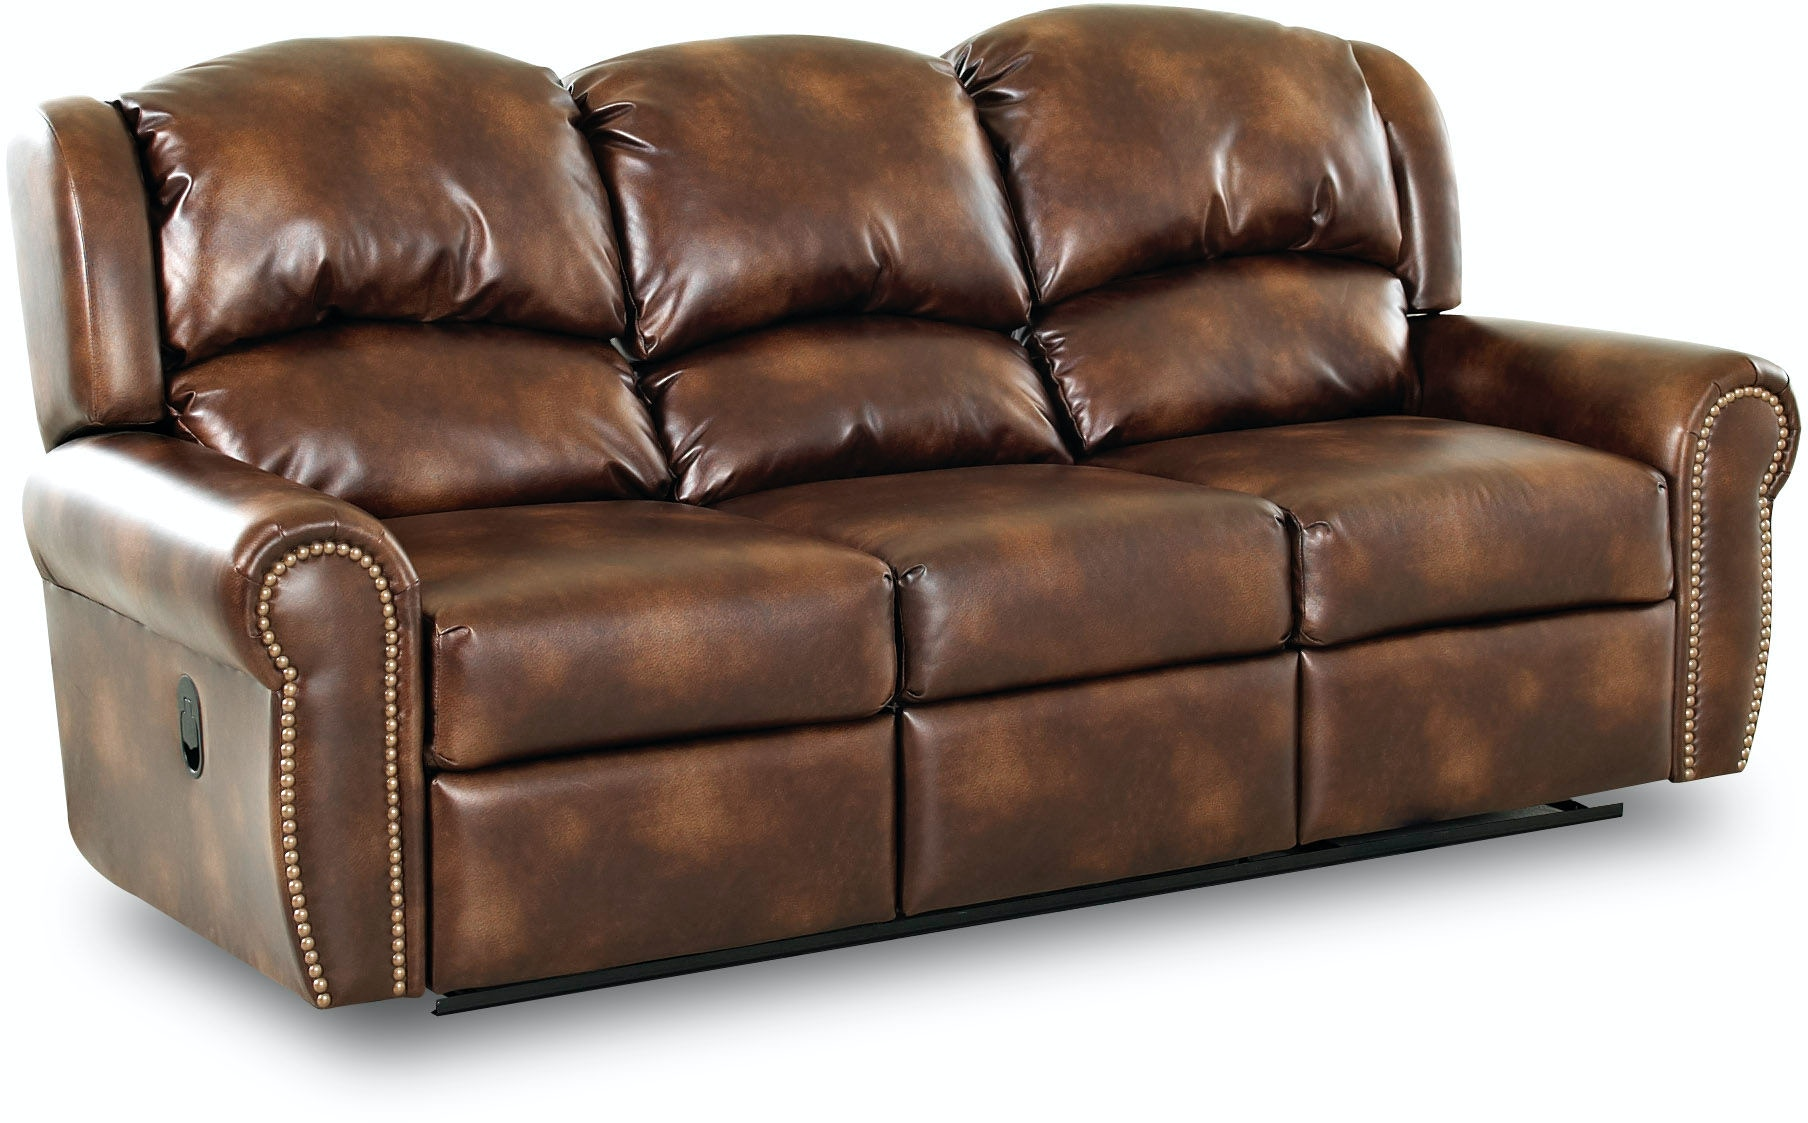 32413 Rs Klaussner Reclining Sofa Karl S